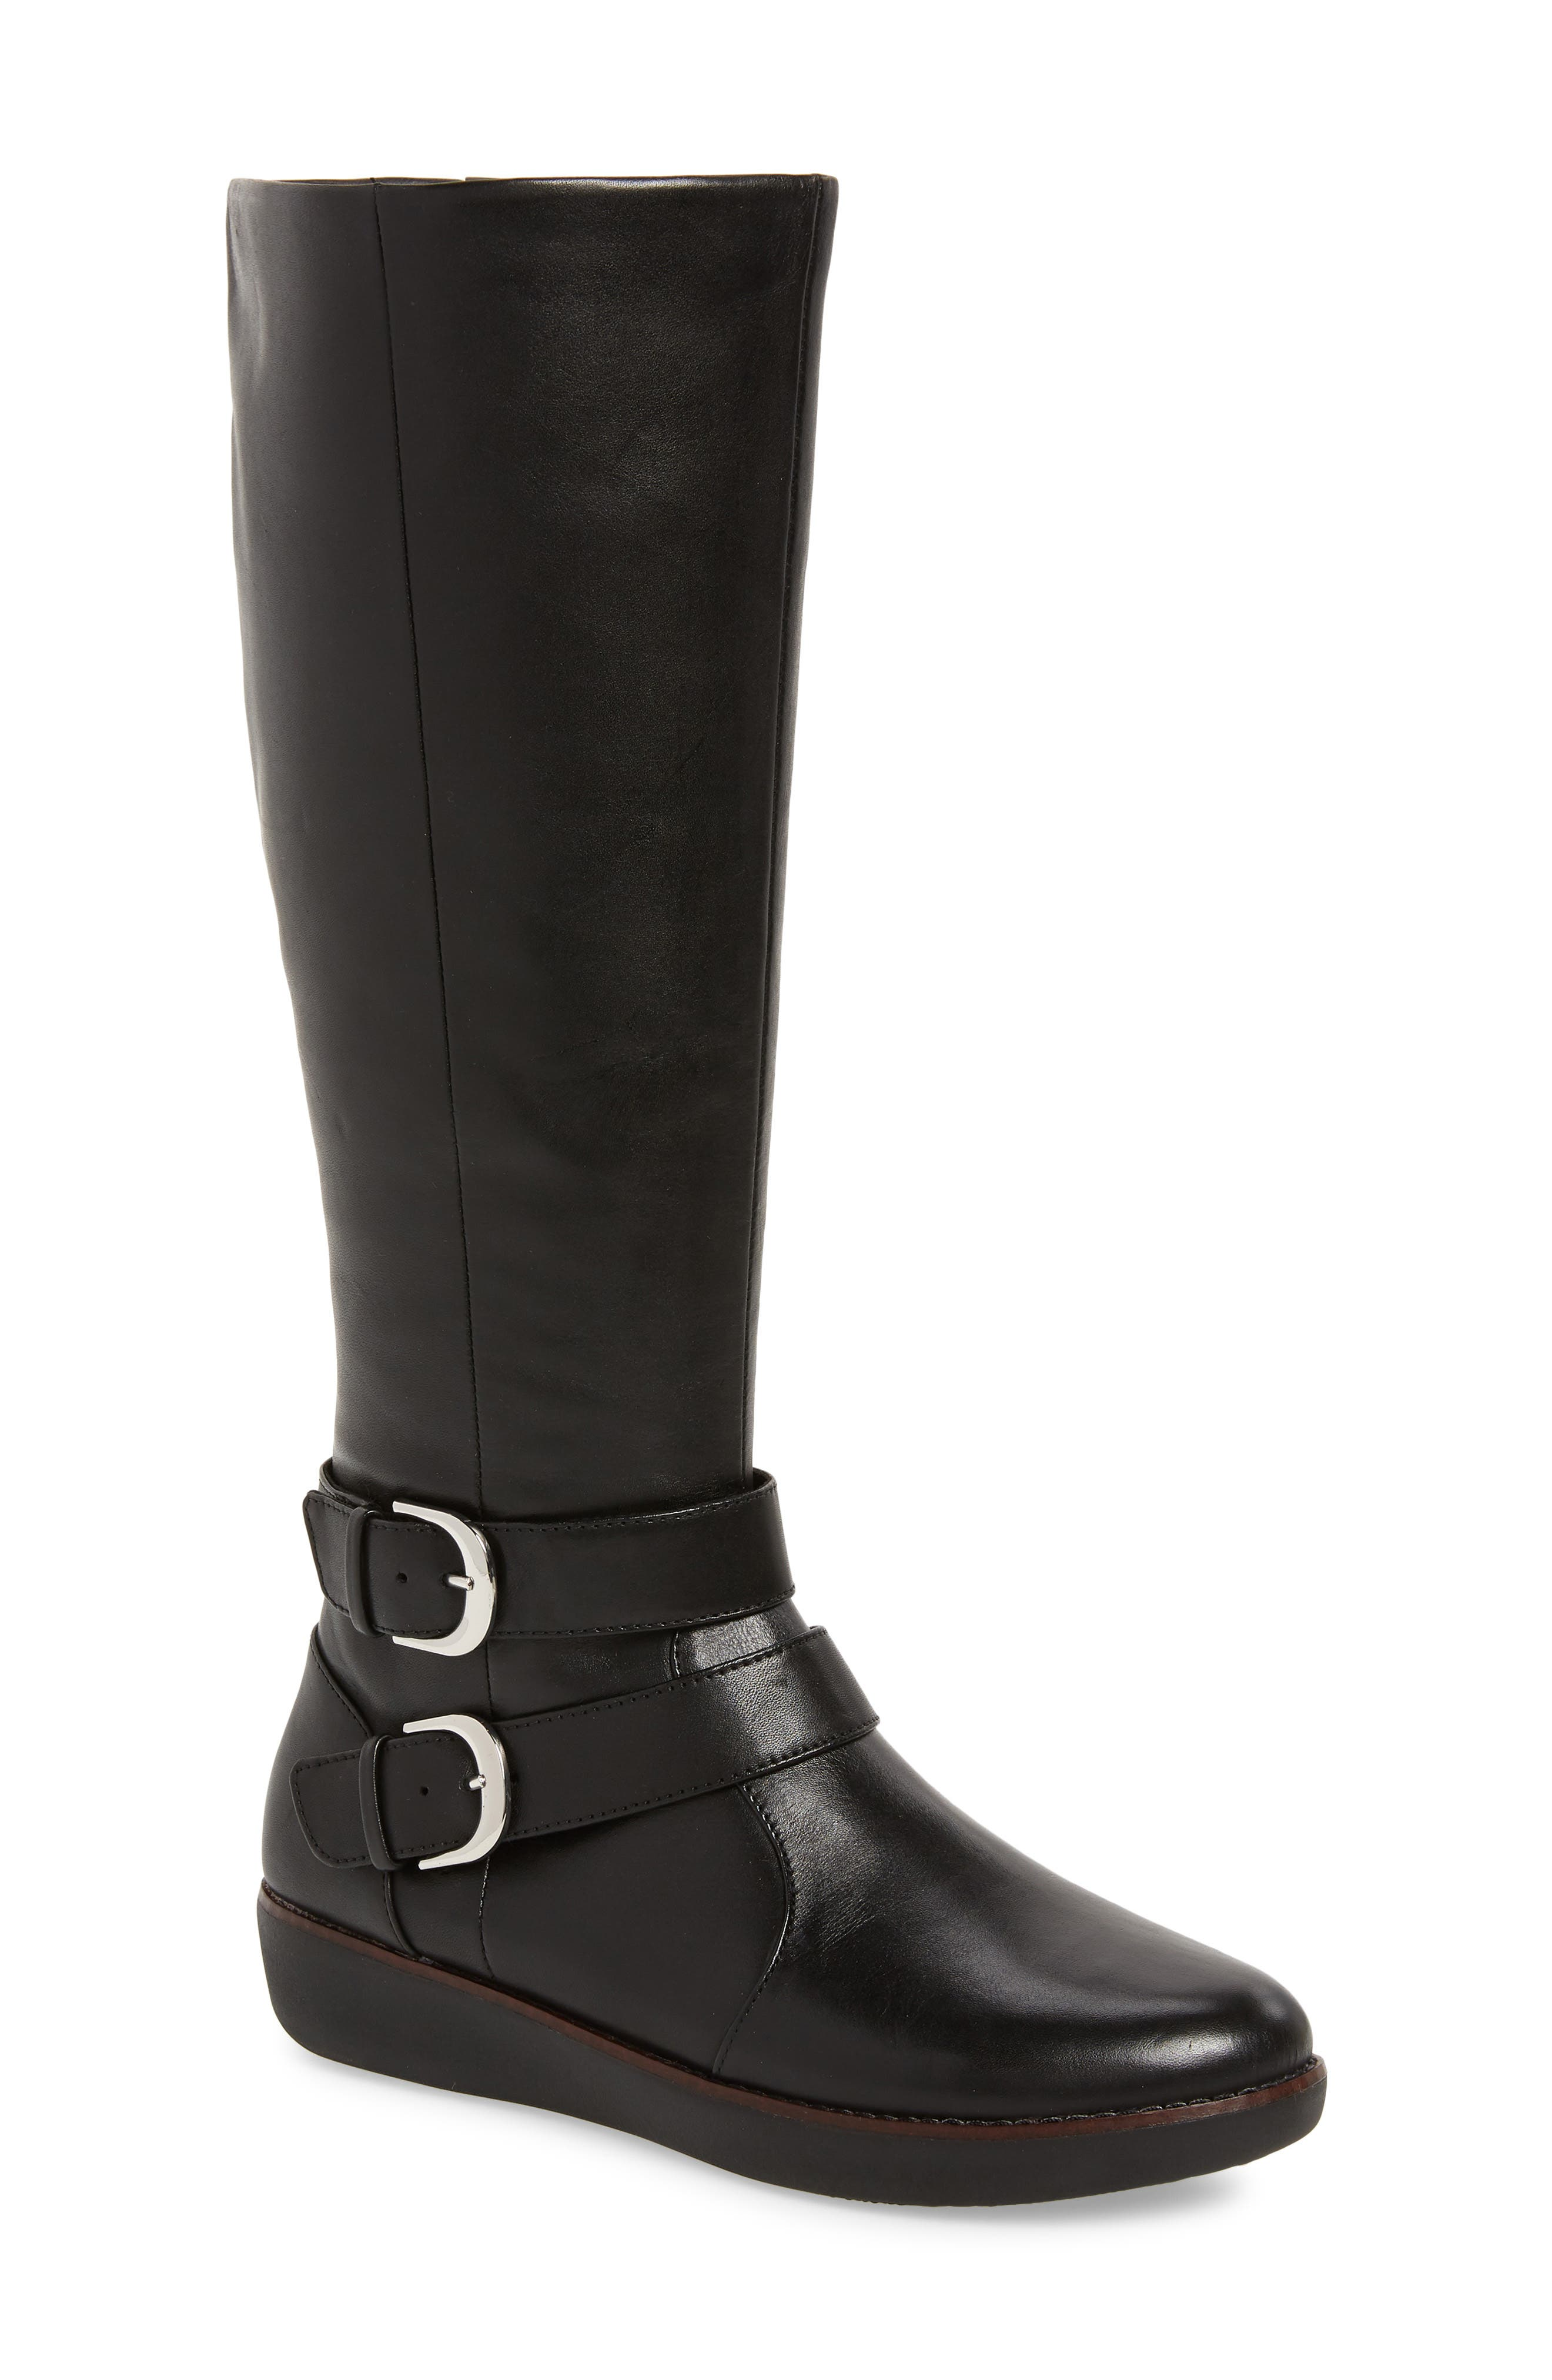 Fitflop Noemi Double Buckle Knee High Boot, Black